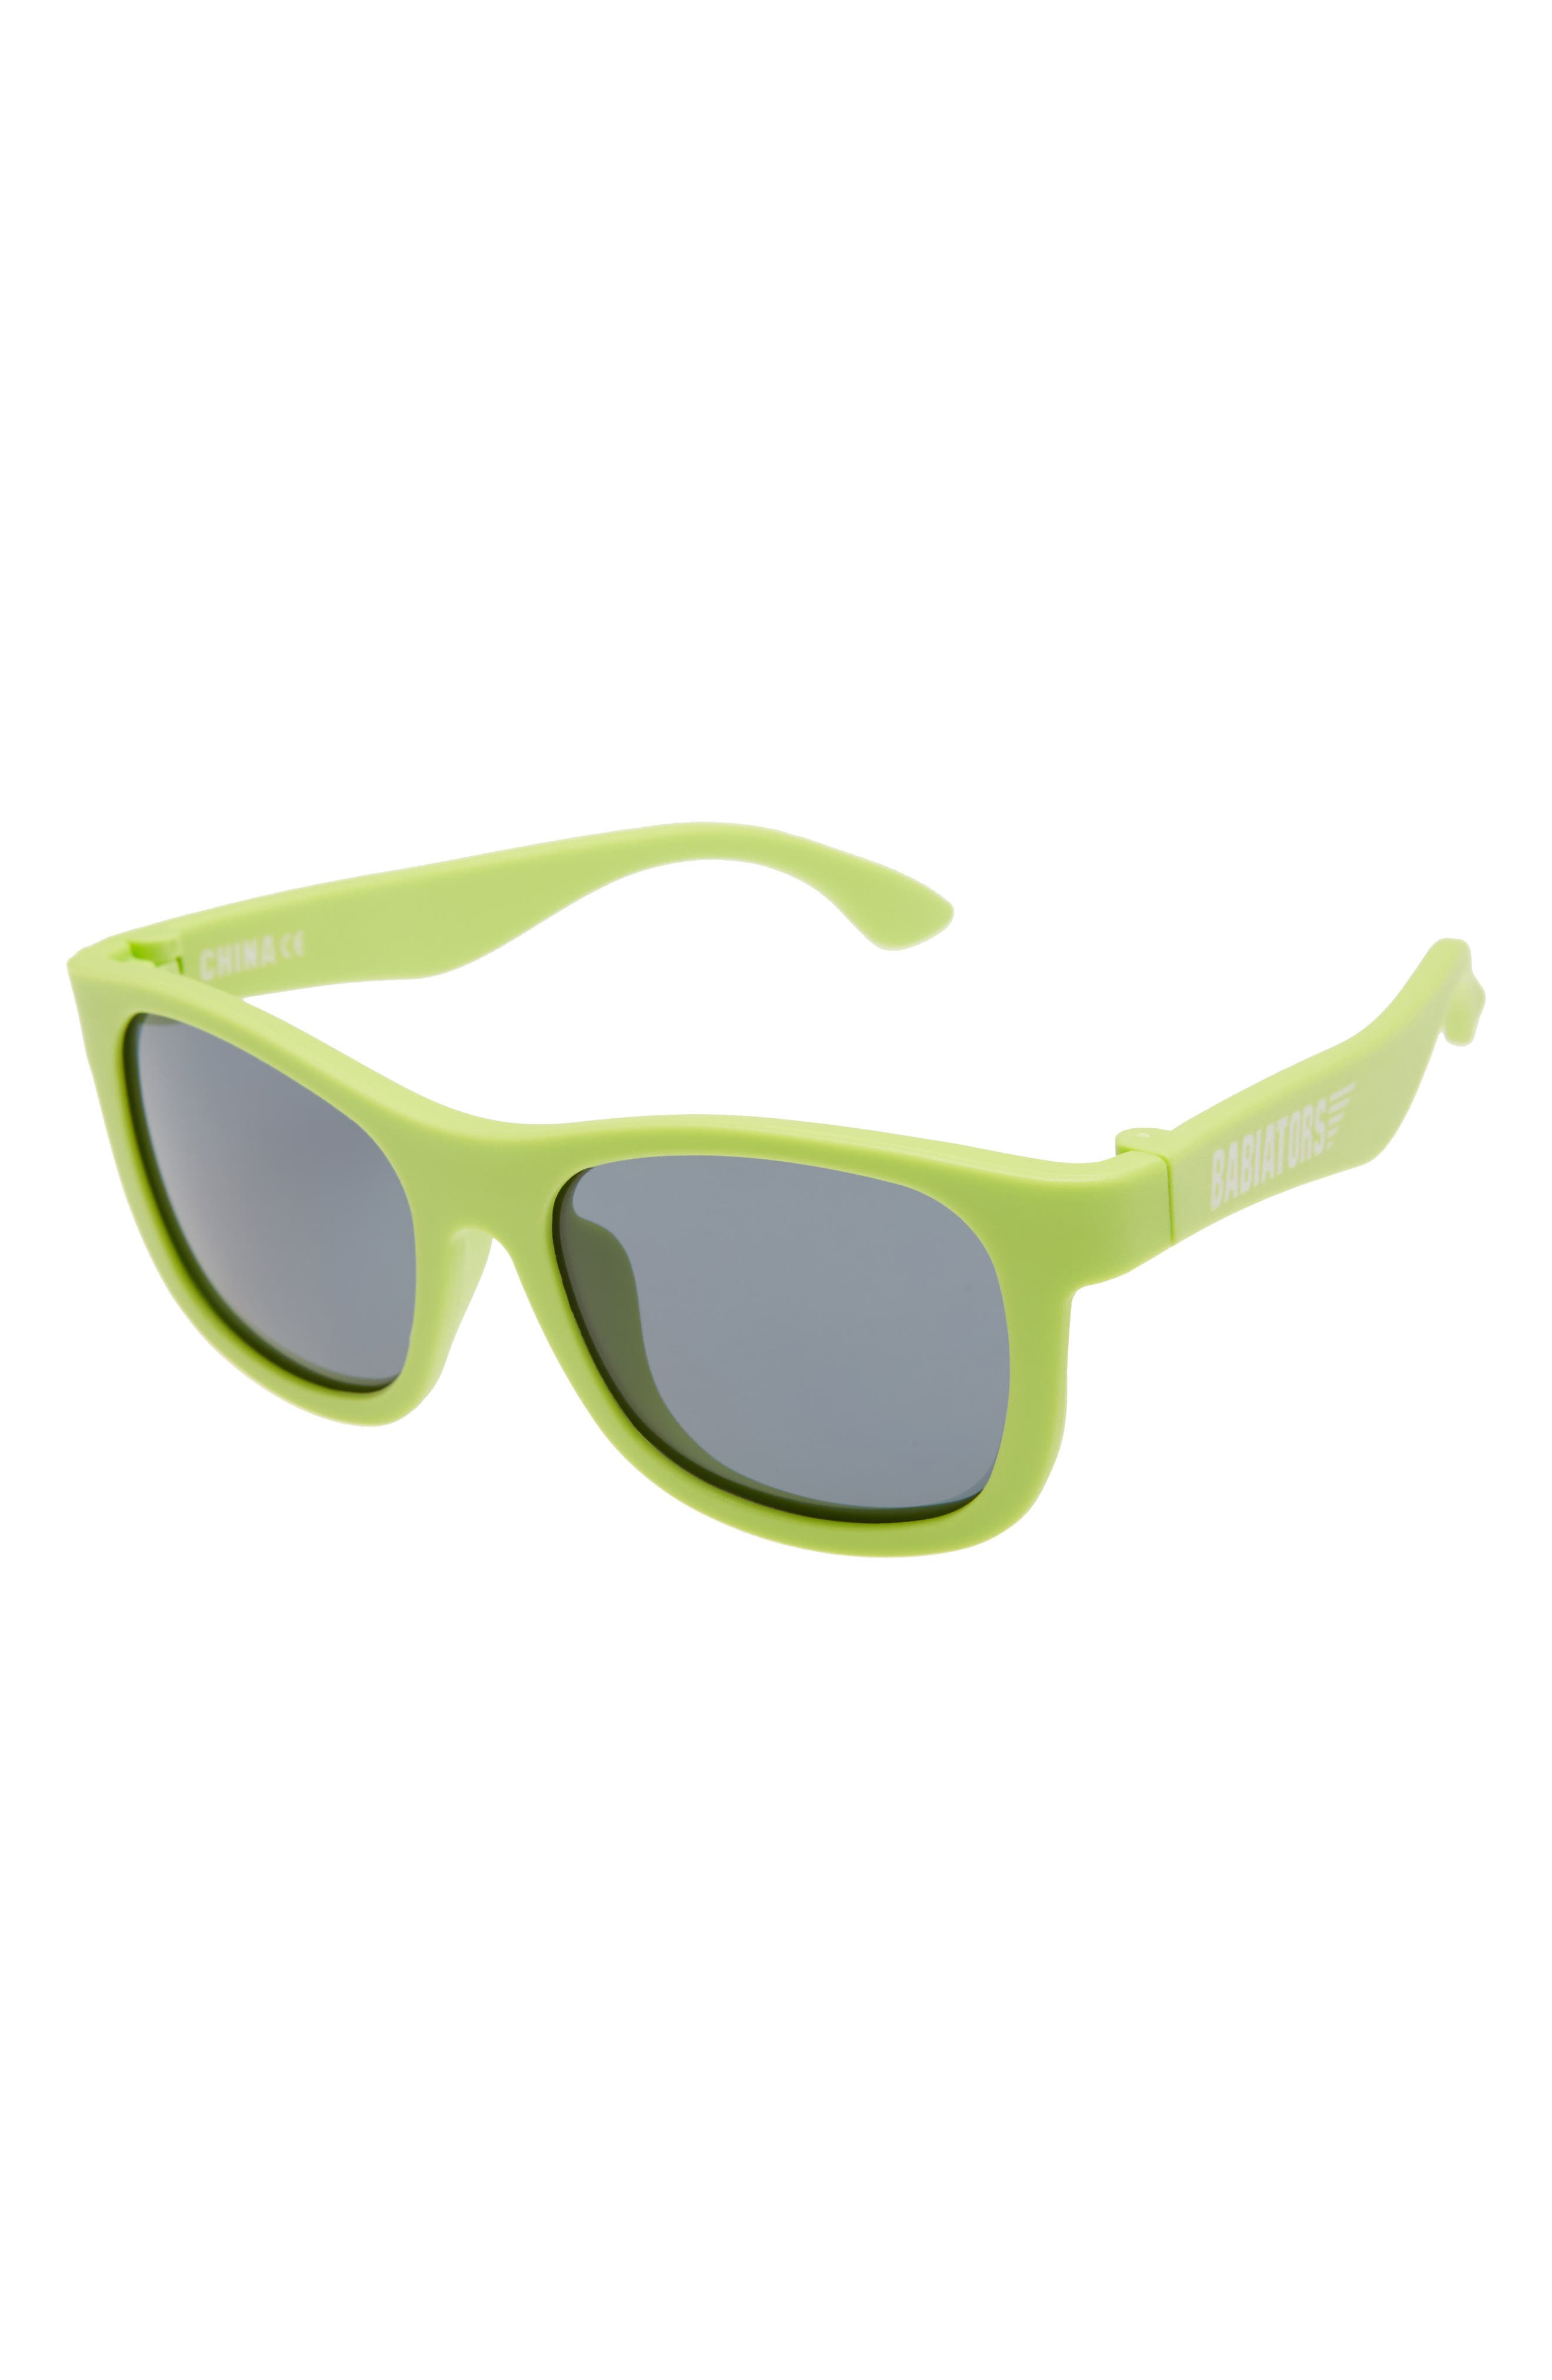 Original Navigators Sunglasses,                             Main thumbnail 1, color,